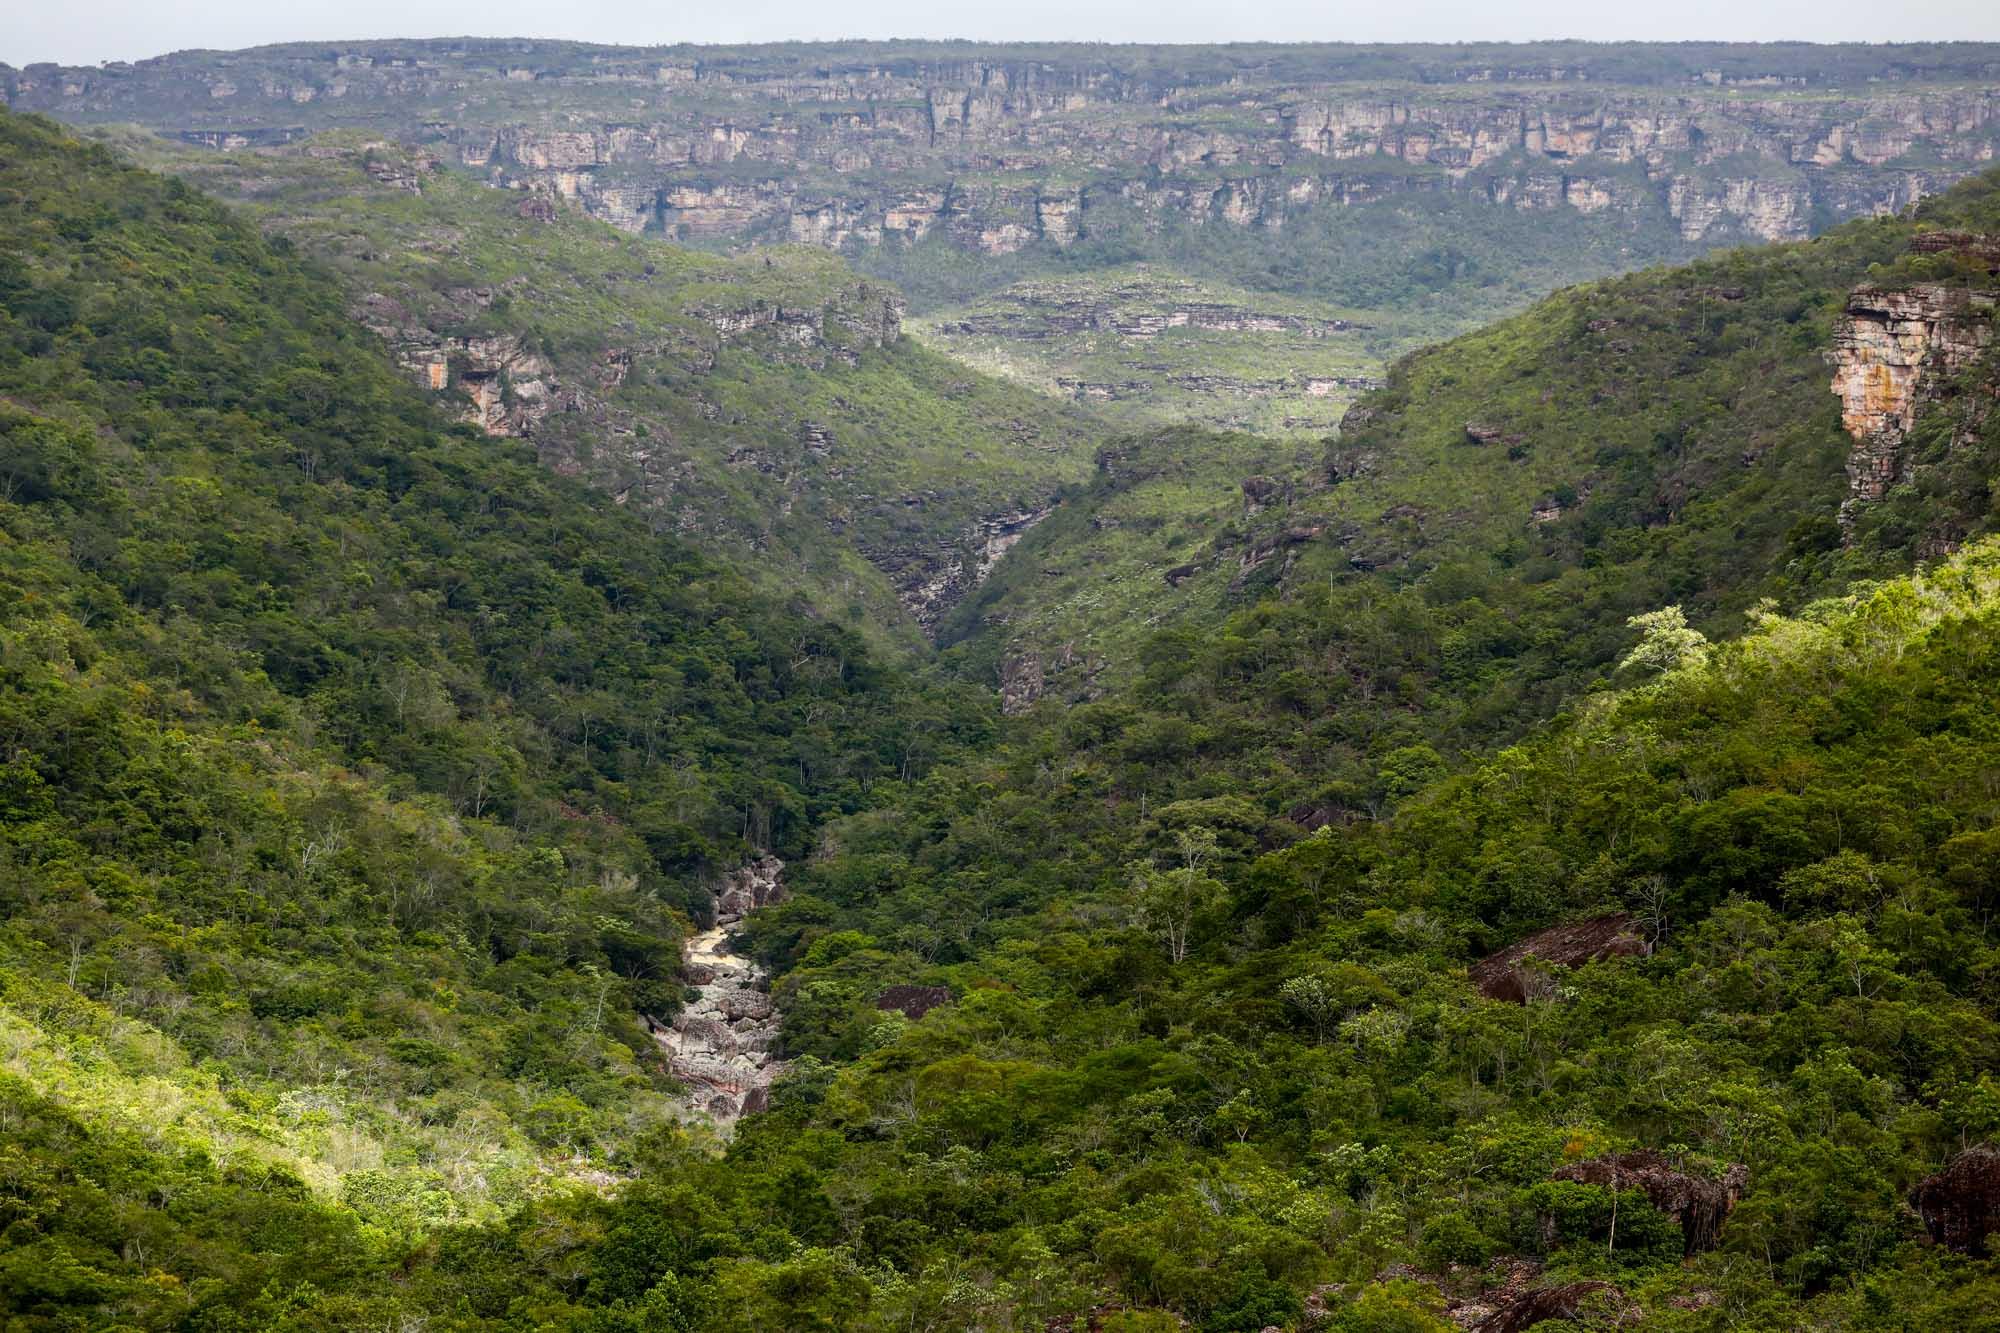 Trilha para a Cachoeira do Sossego na Chapada Diamantina